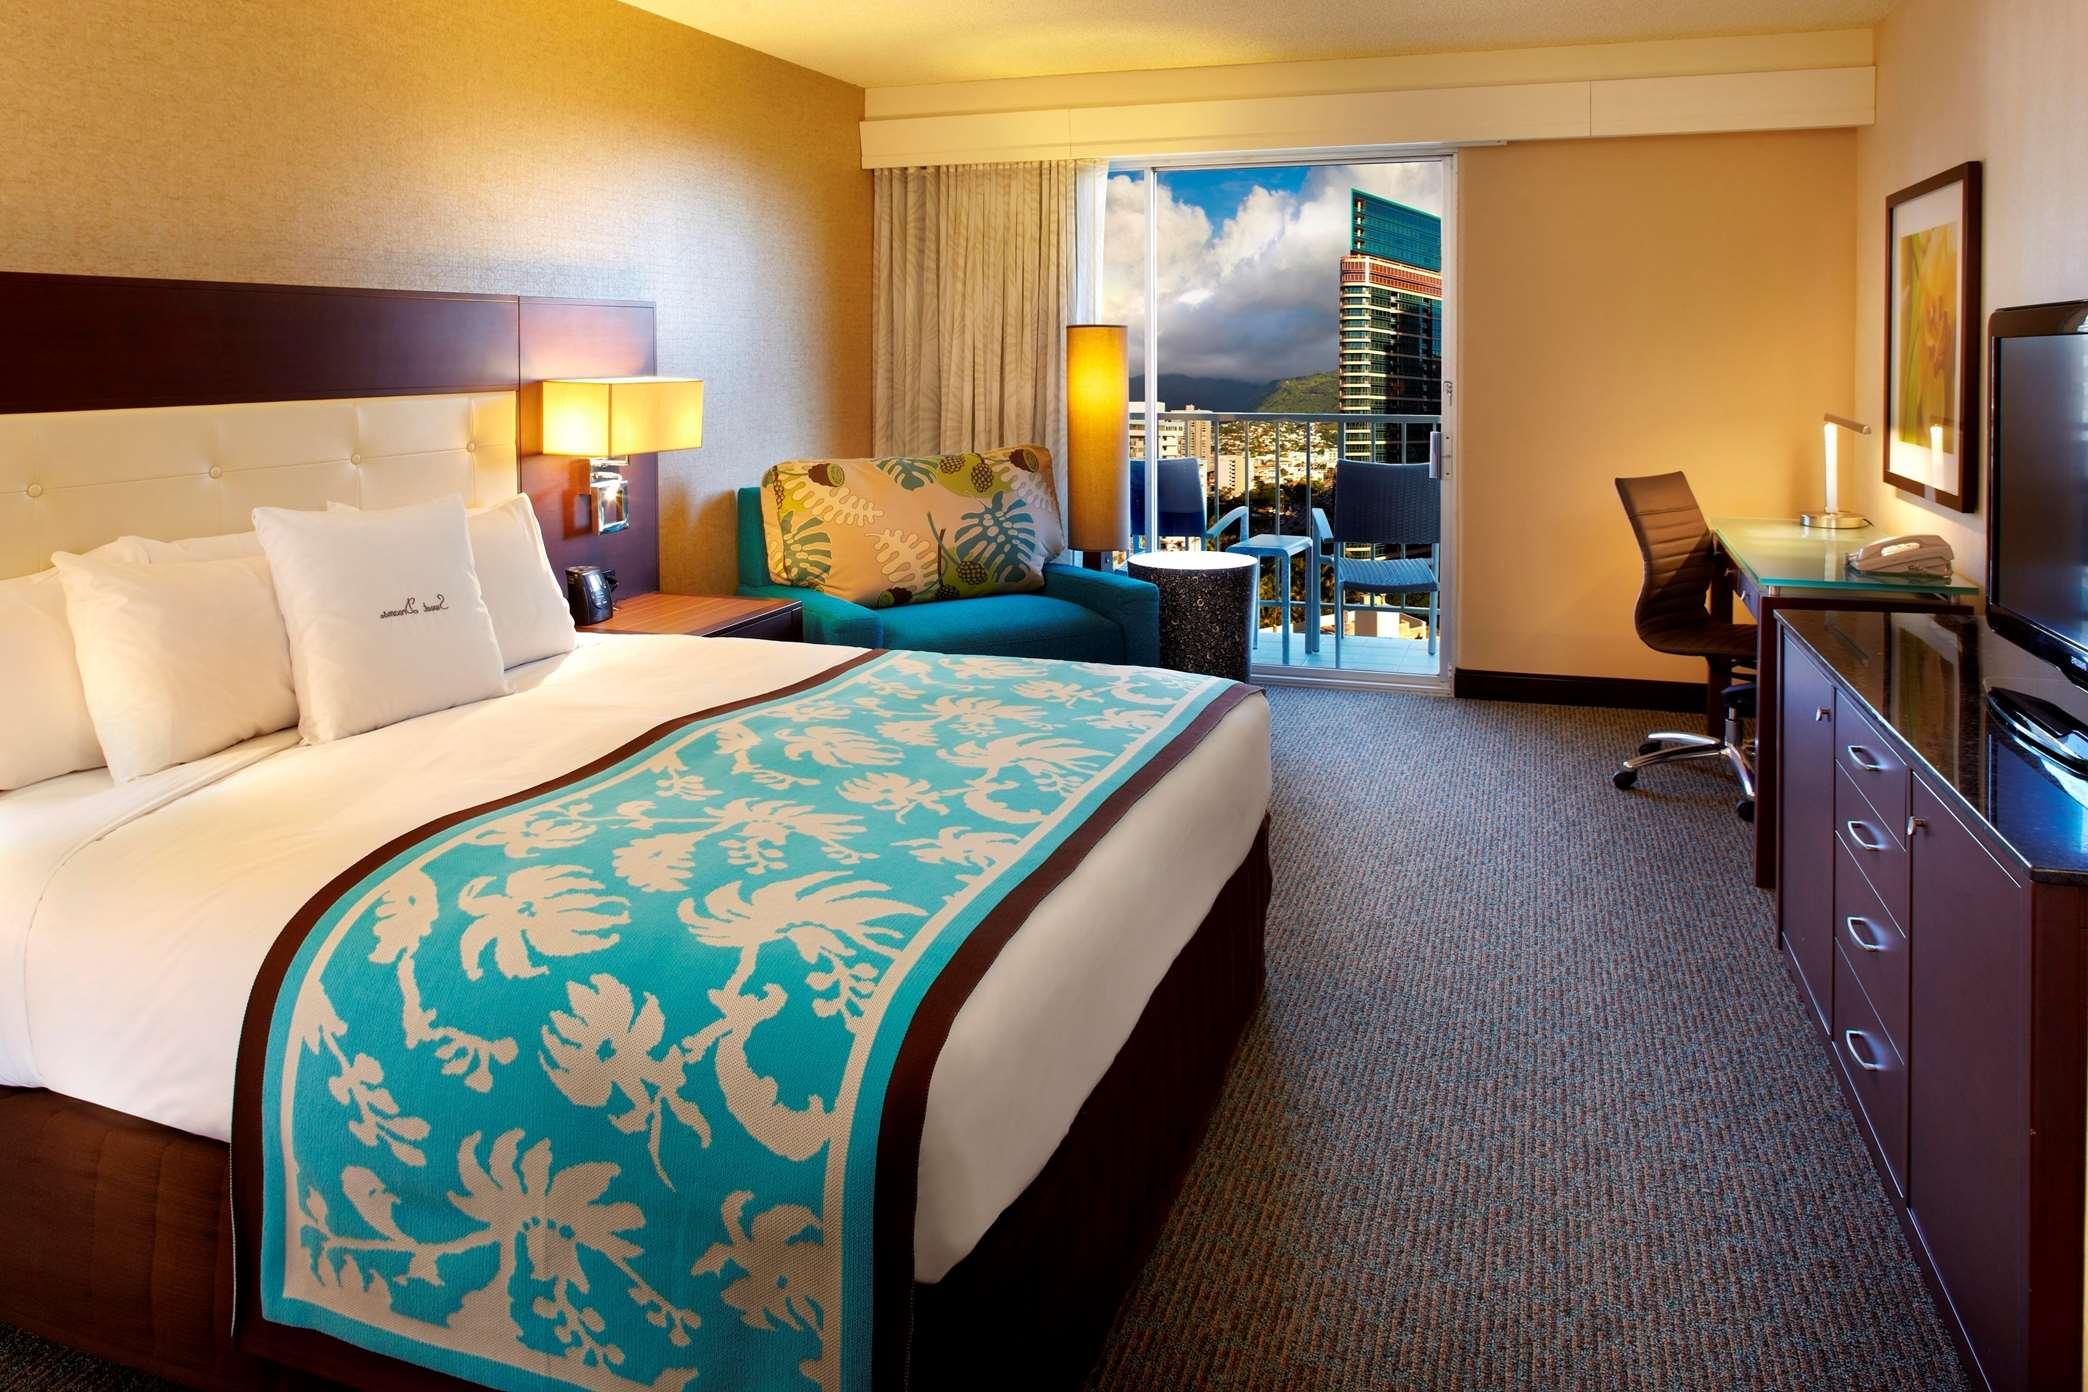 DoubleTree by Hilton Hotel Alana - Waikiki Beach image 10